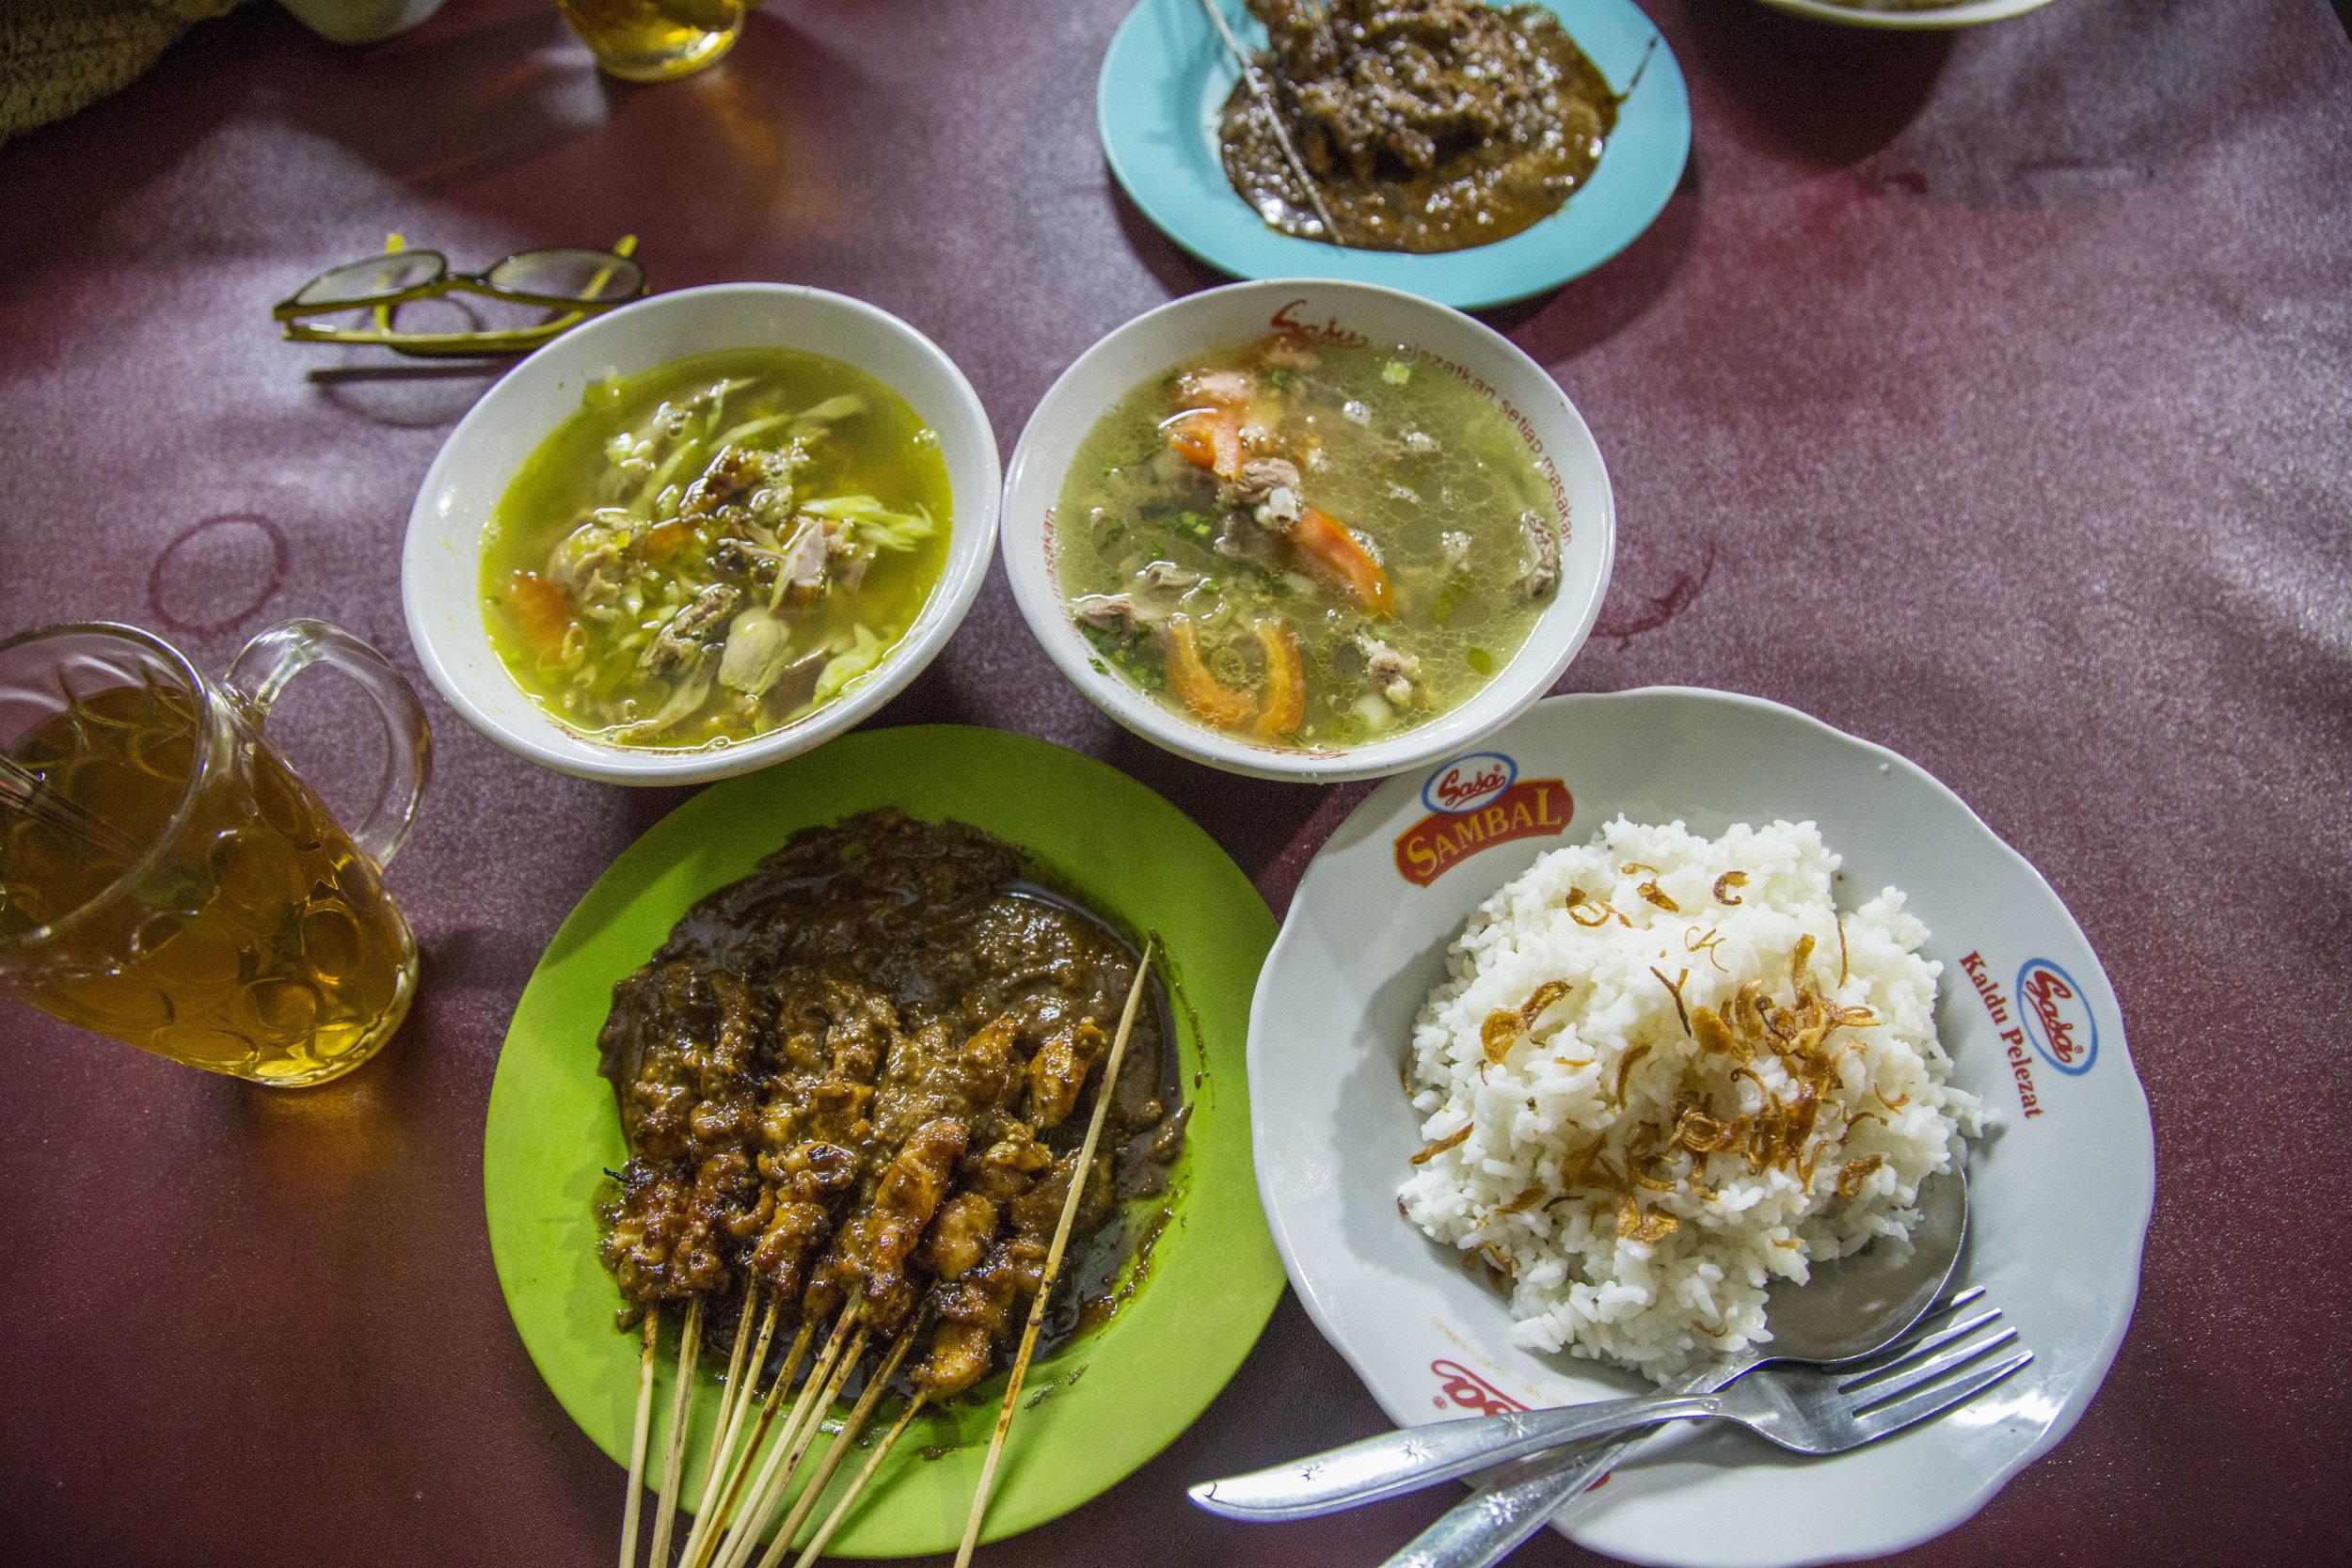 Satay and soup